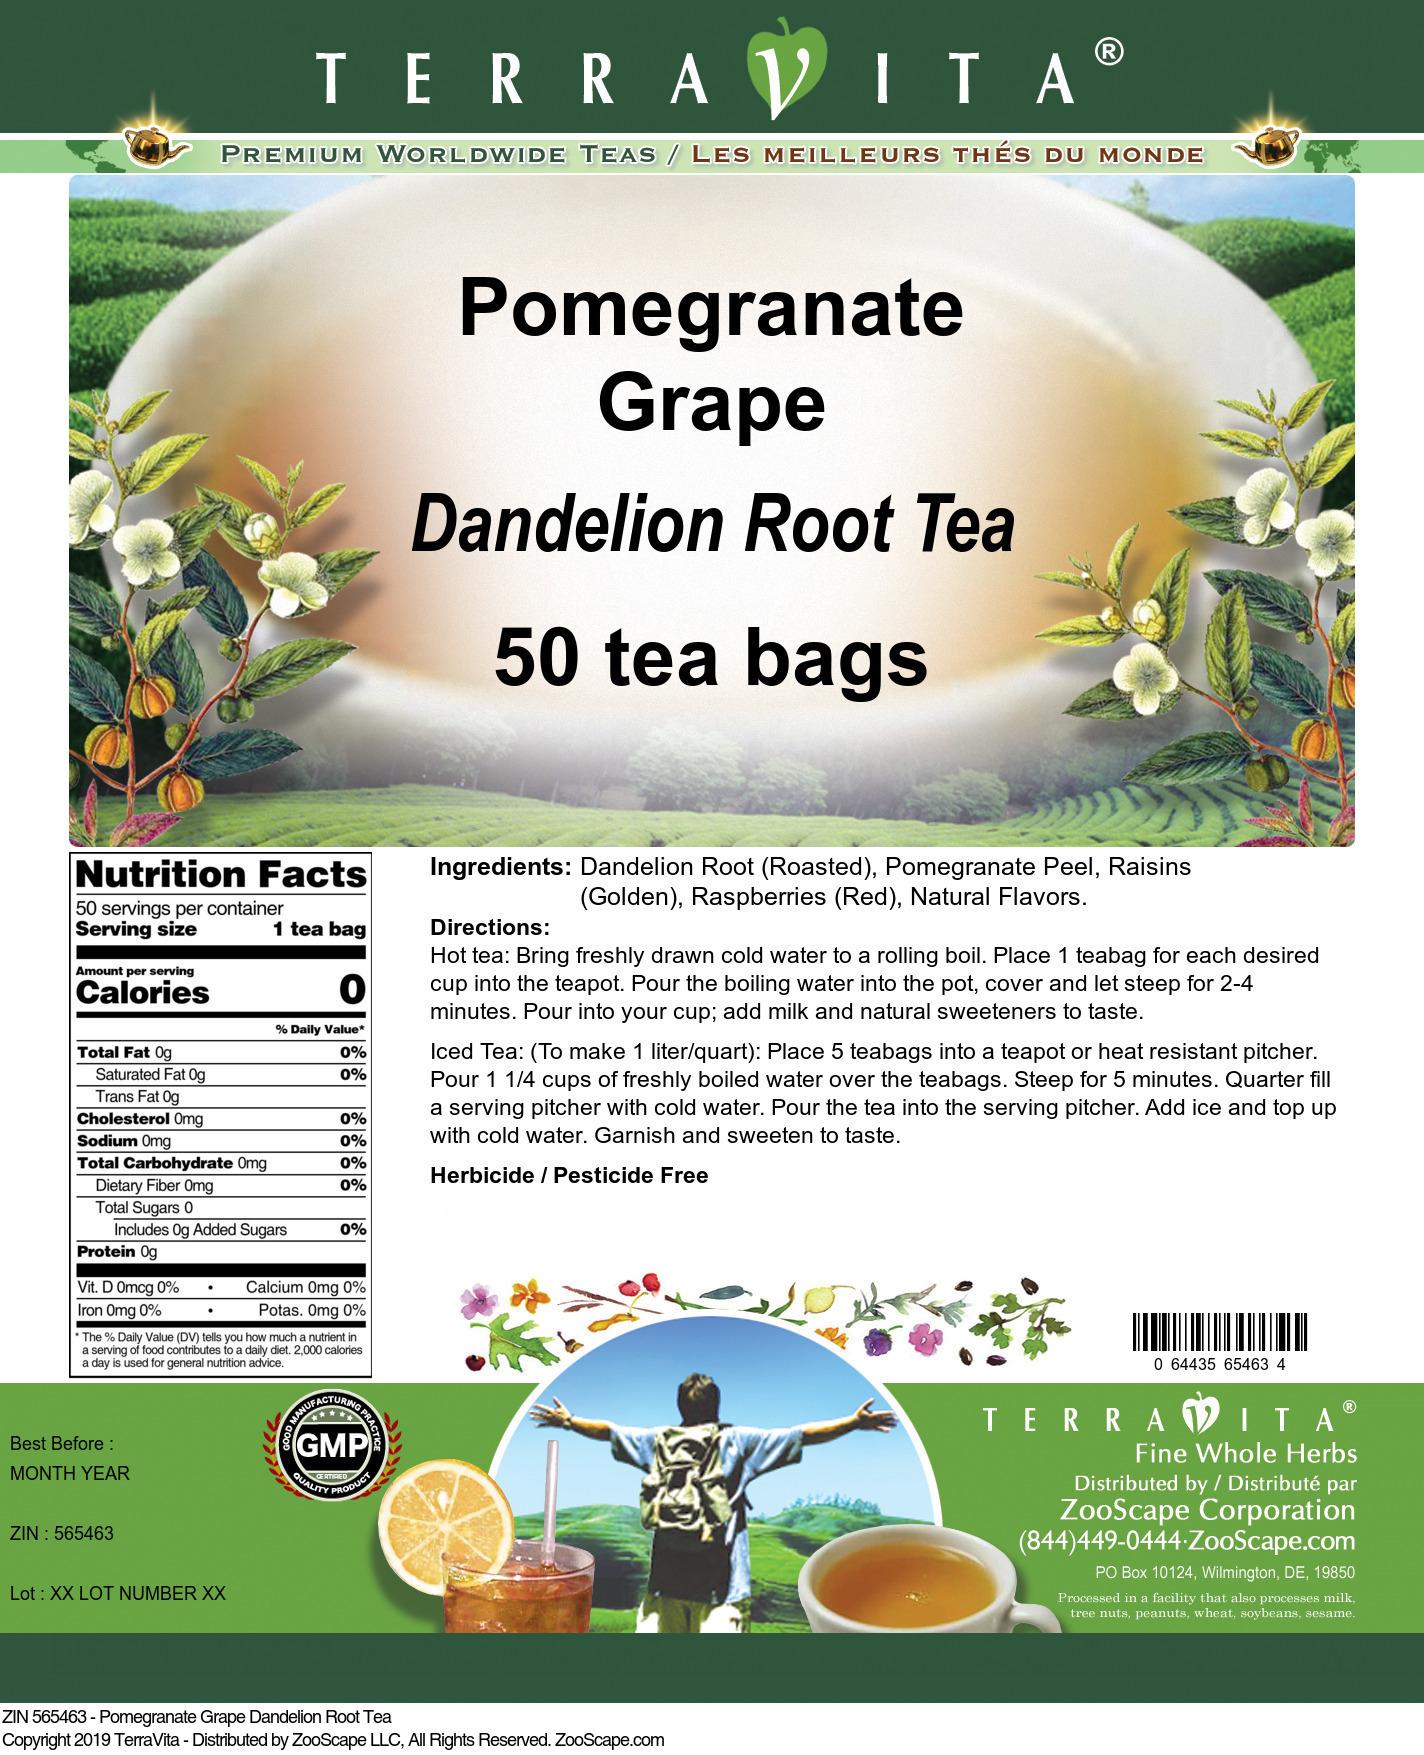 Pomegranate Grape Dandelion Root